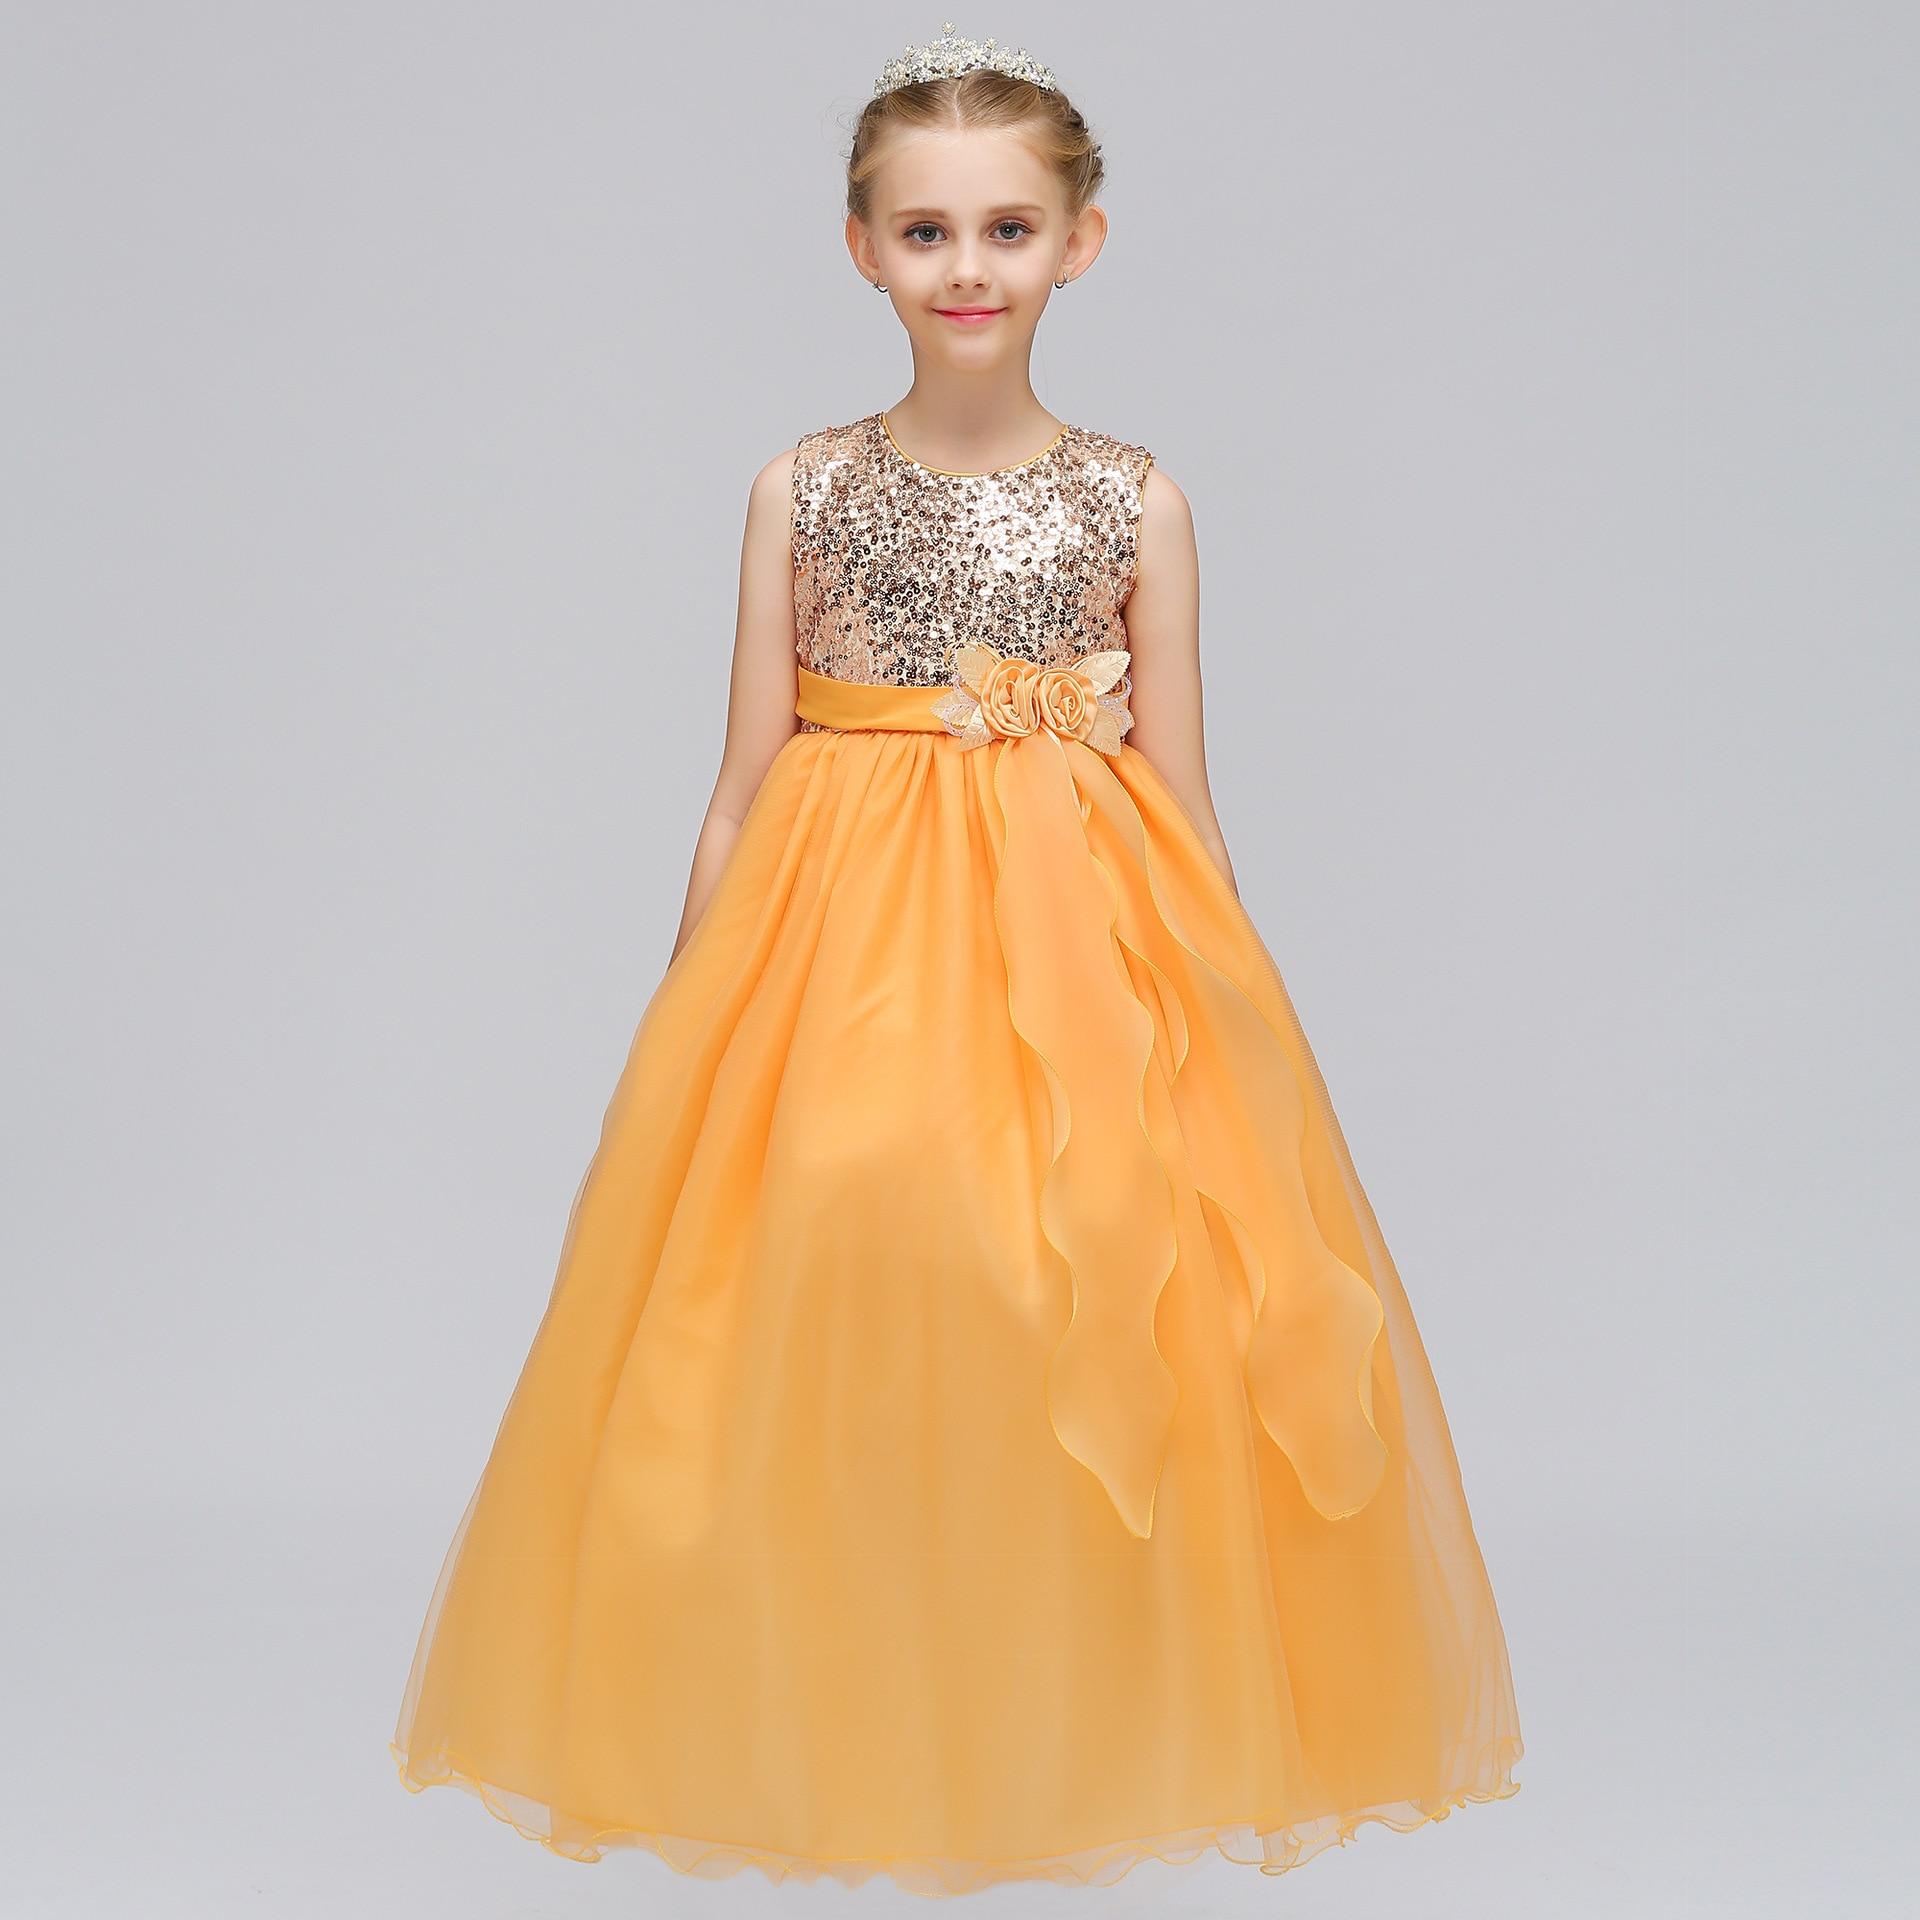 Robe Ceremonie Fille Mariage Enfant Lavender Mint Yellow Special ...